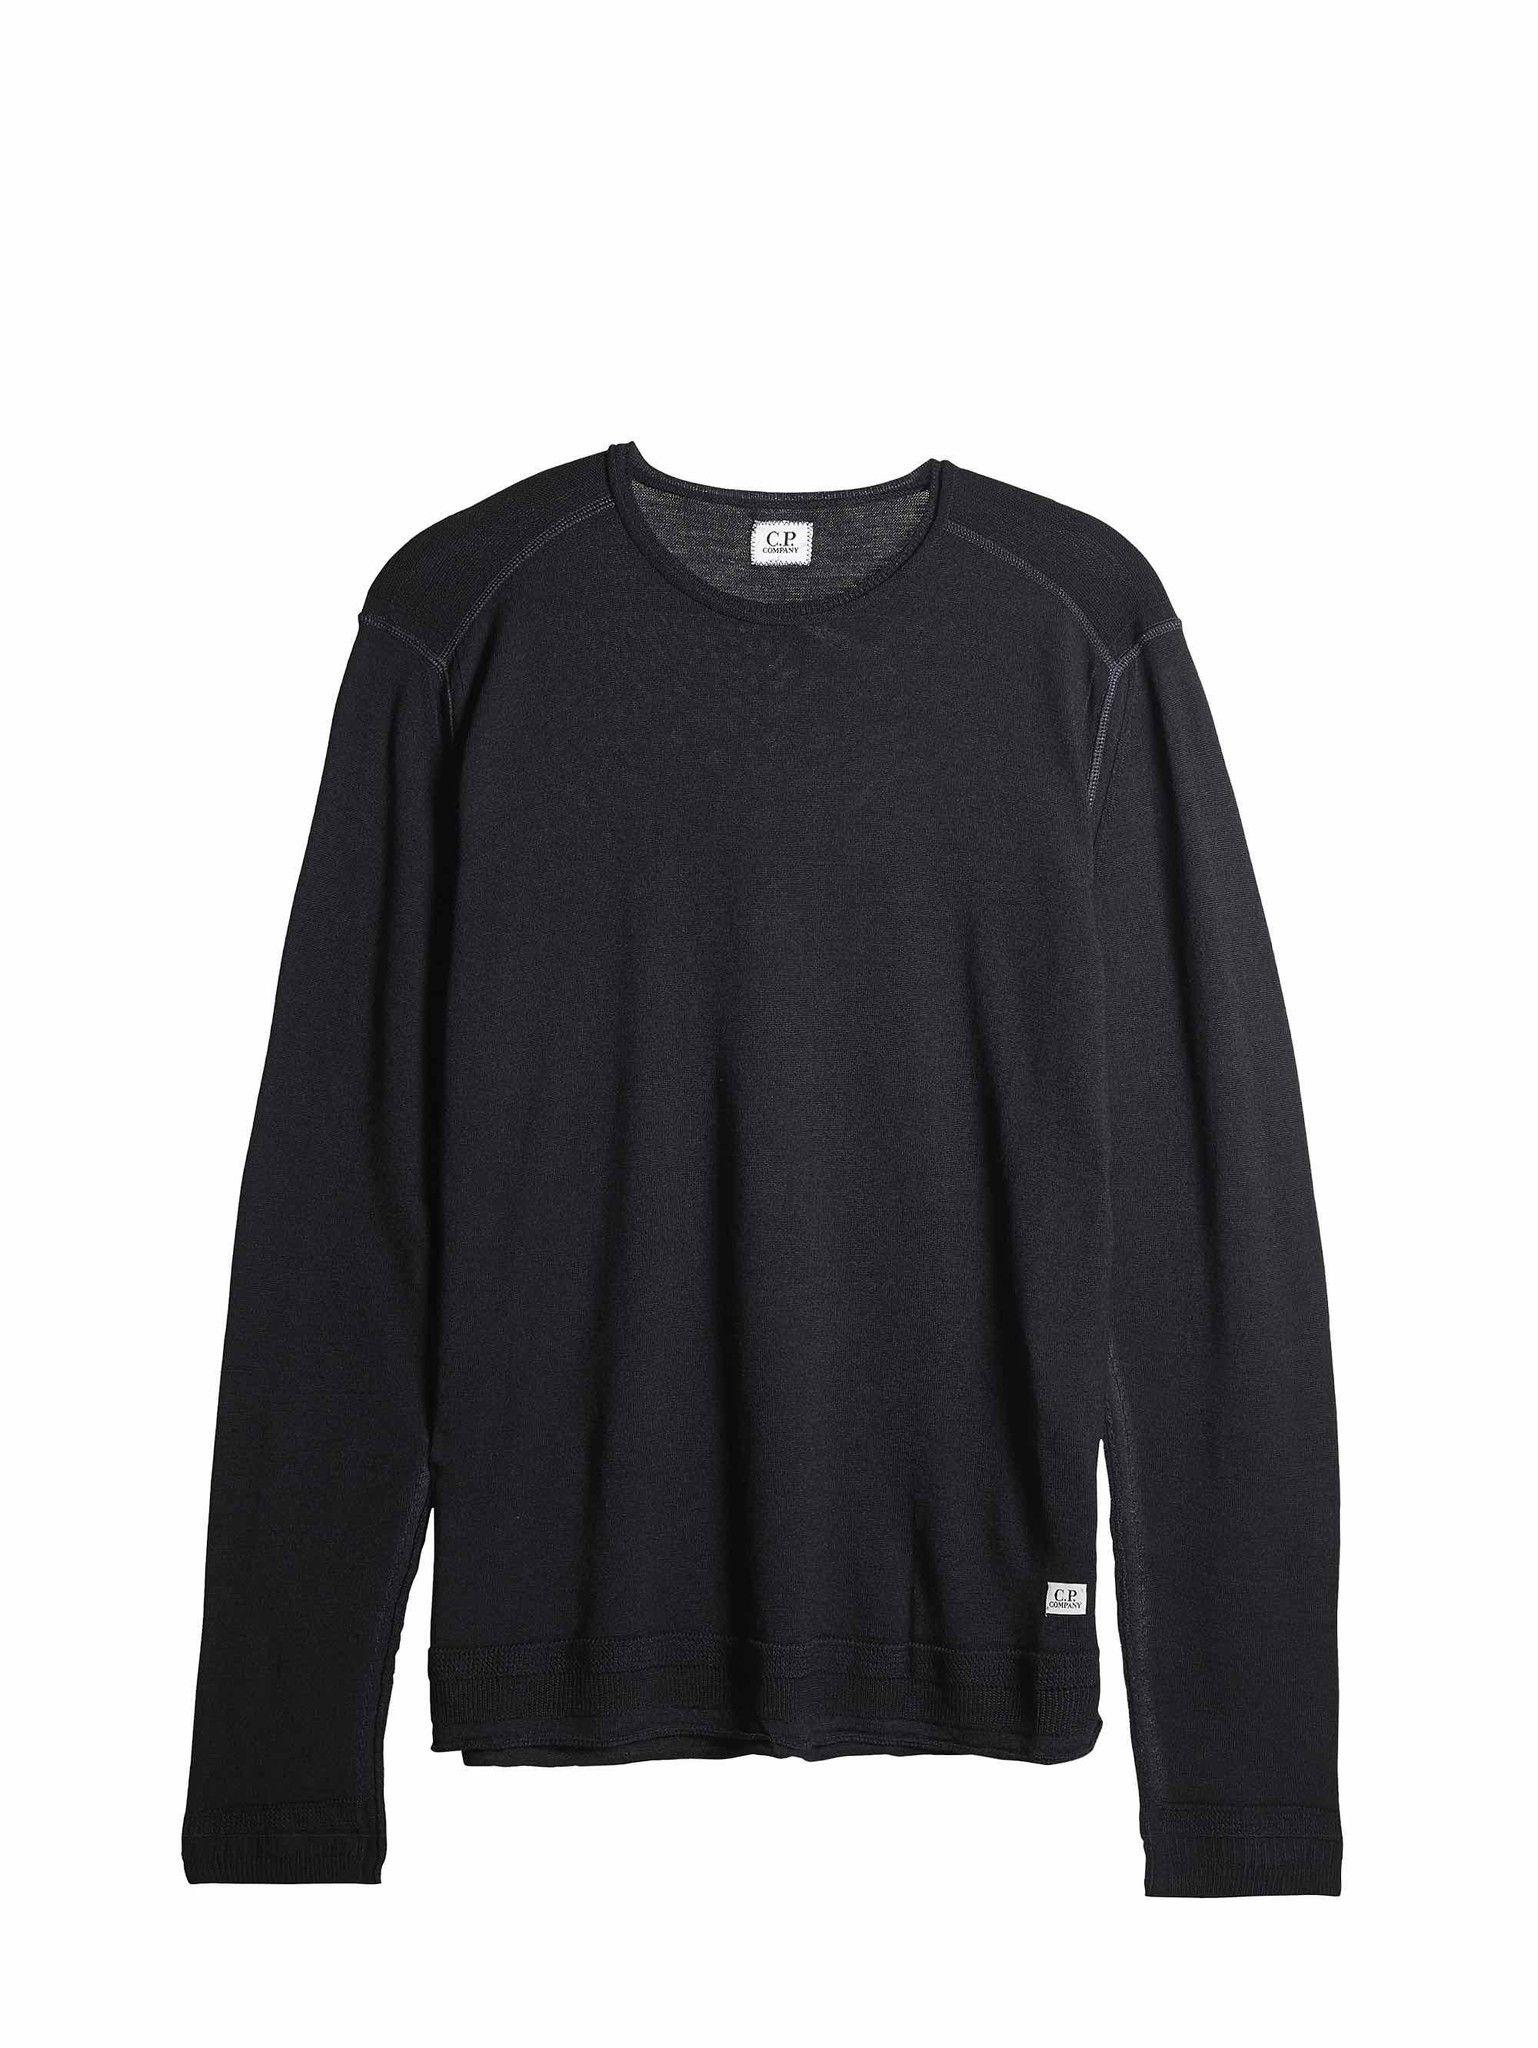 C.P. Company 14 Gauge Merino Wool Sweatshirt in Black